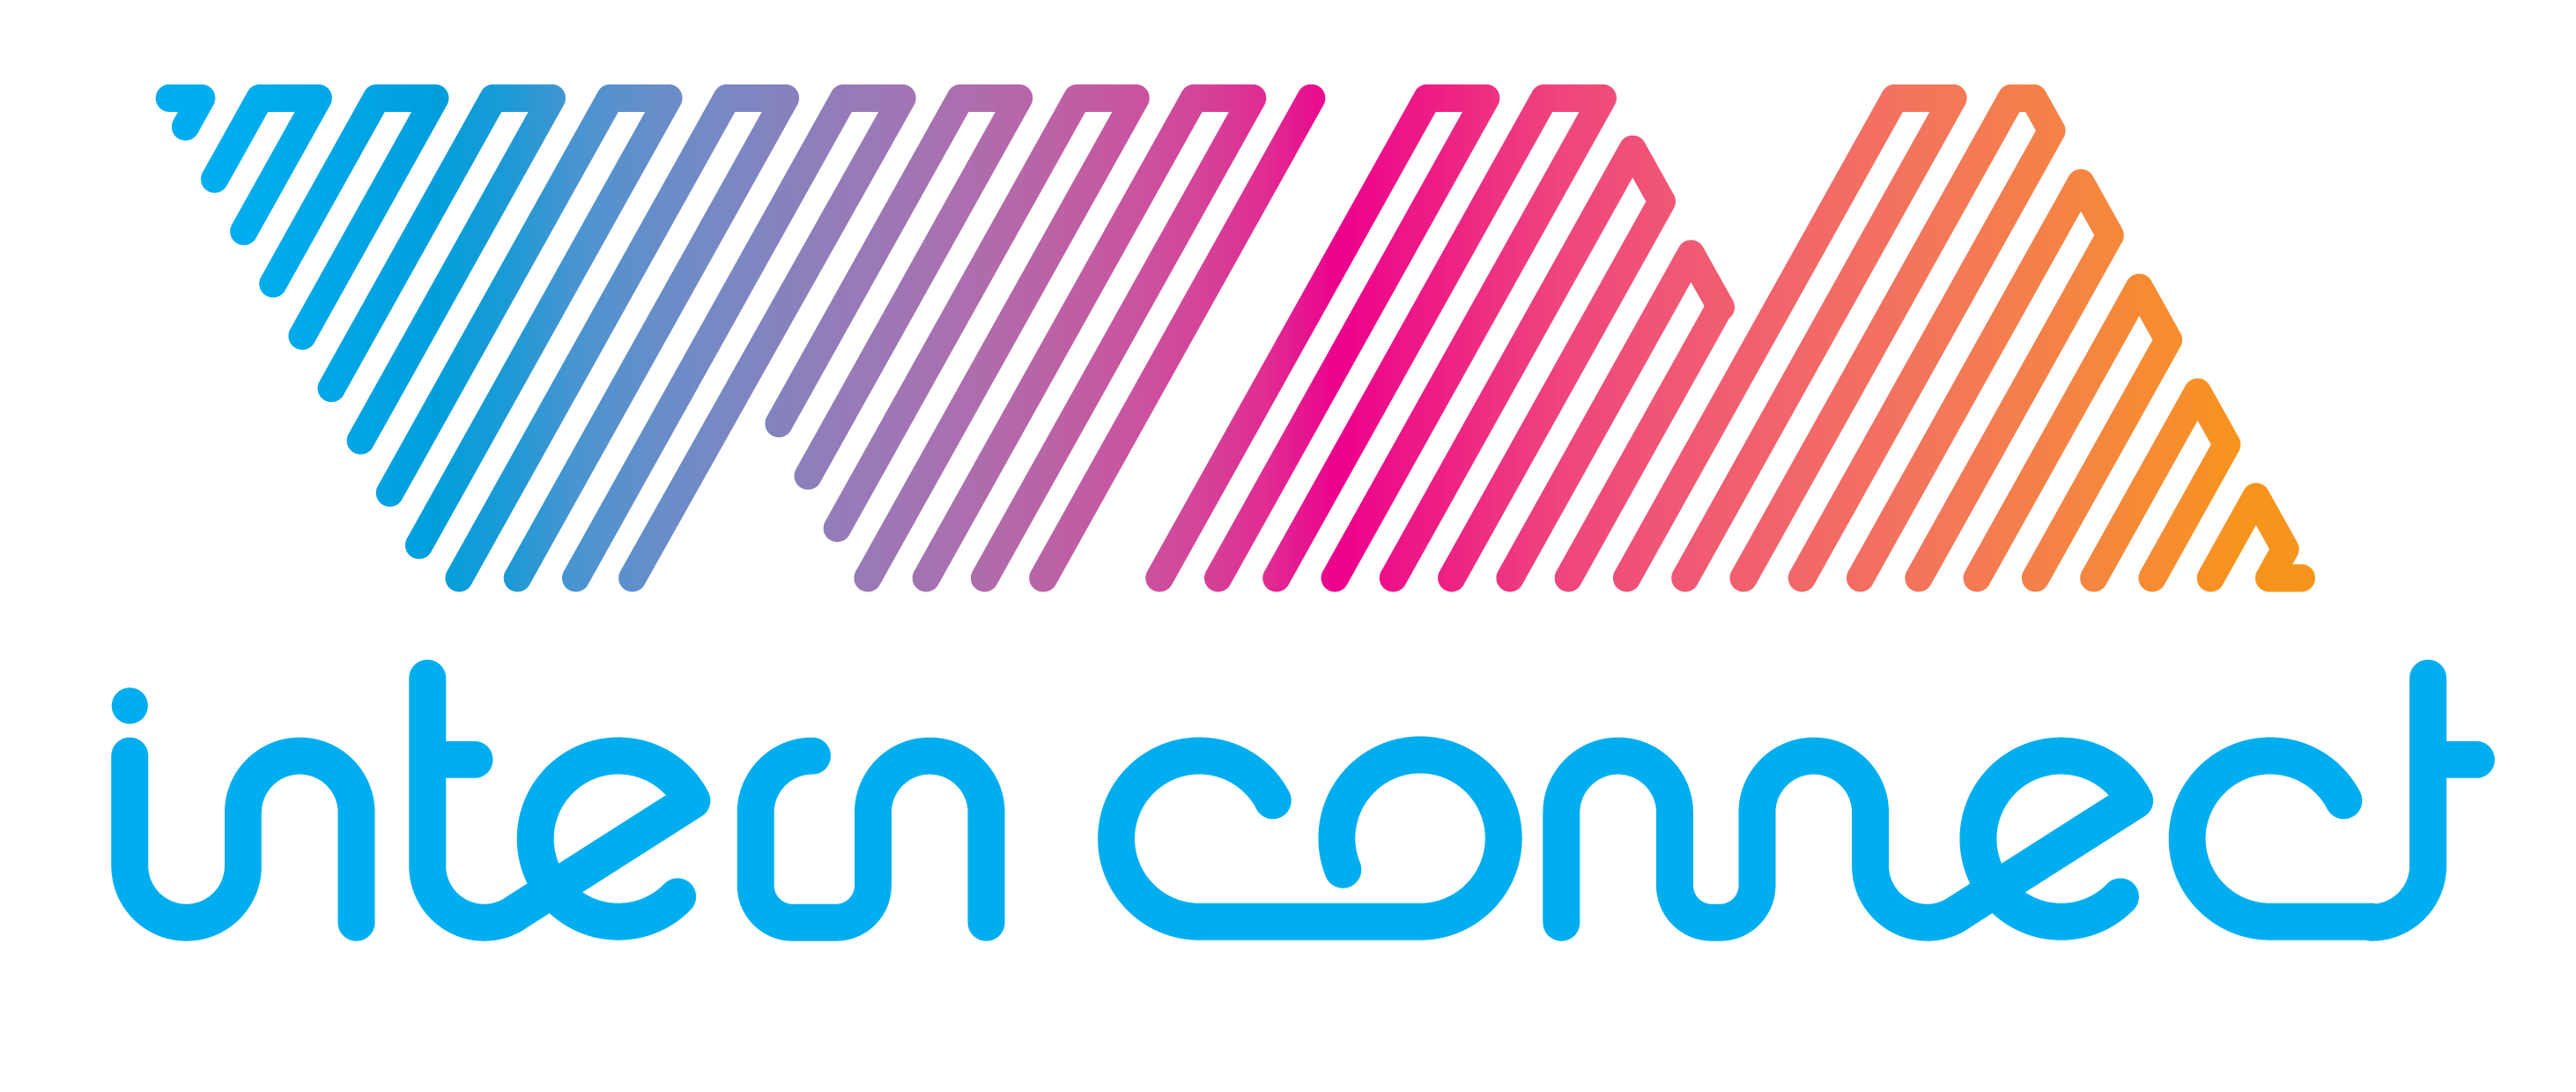 West Michigan Intern Connect Logo